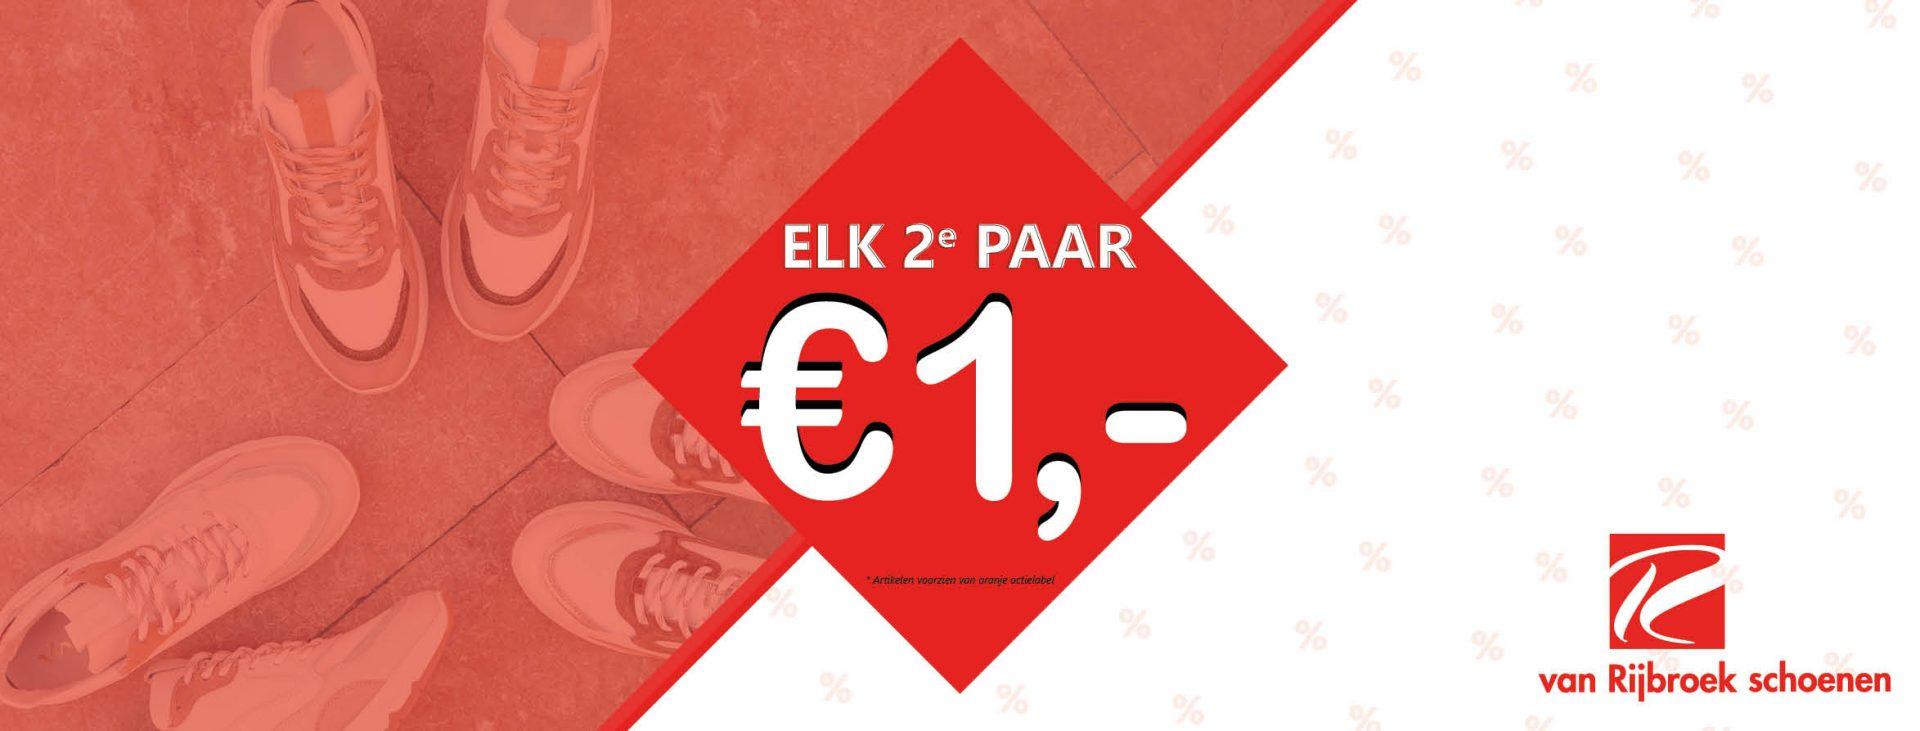 Elk 2e paar €1,-